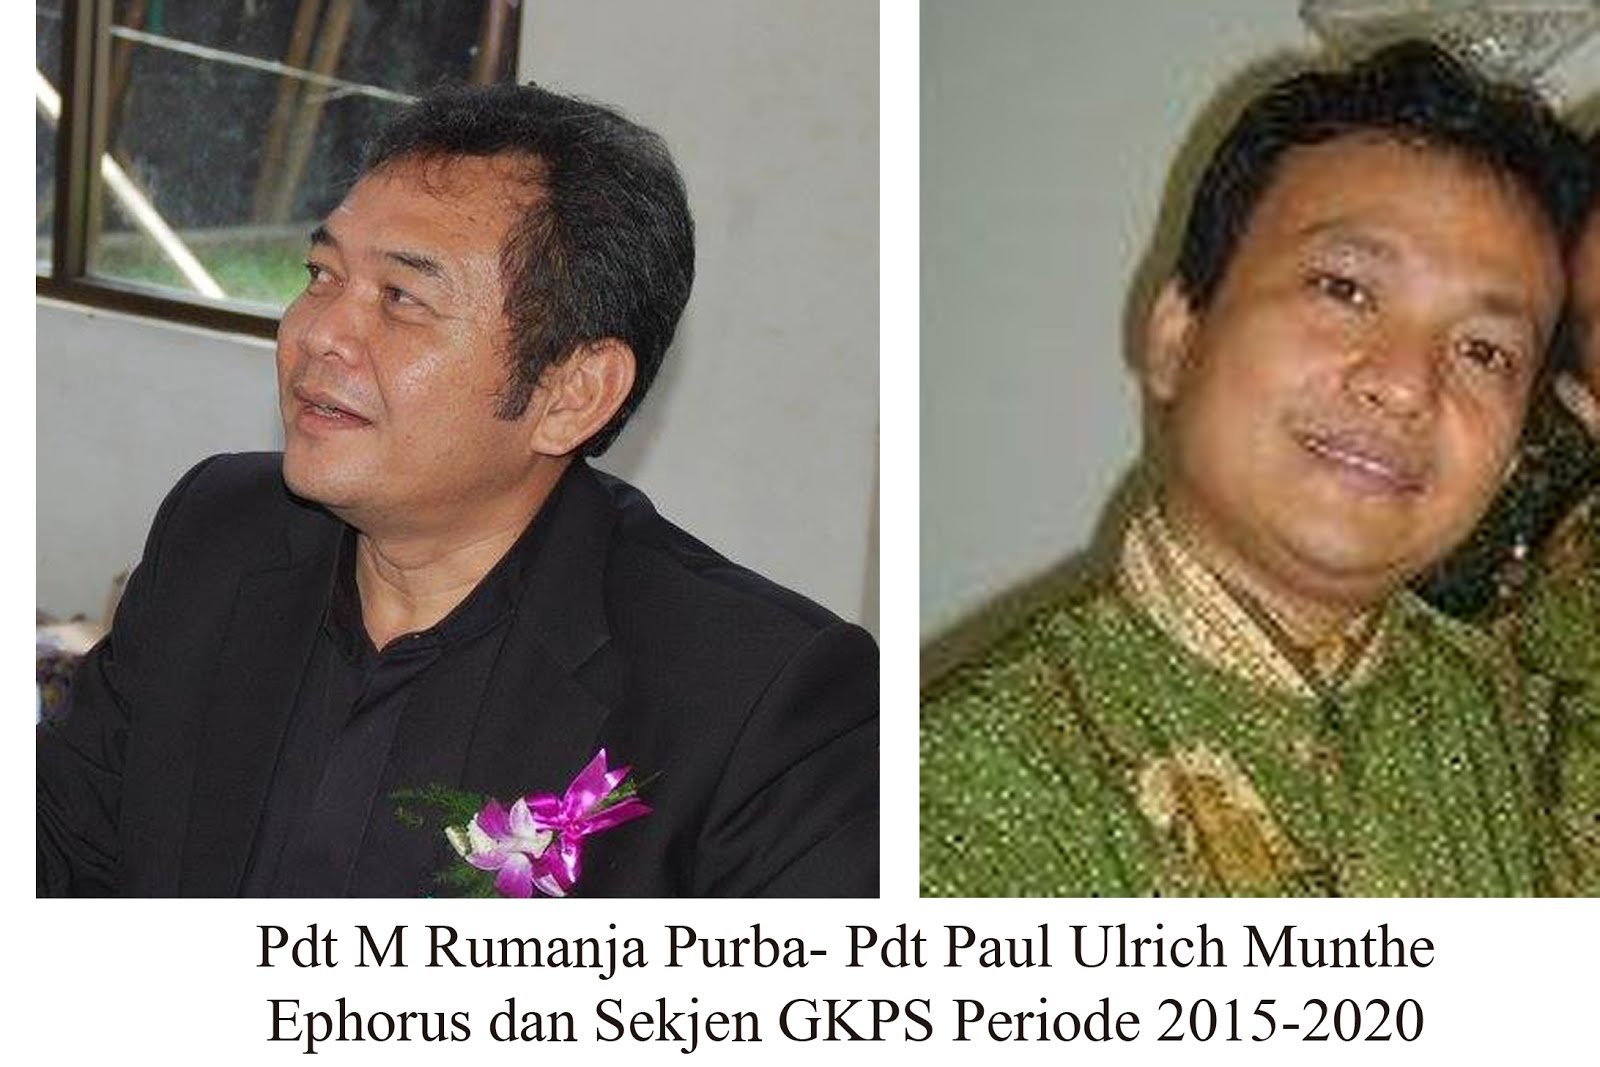 Duet Pdt M Rumanja Purba- Pdt Paul Ulrich Munthe Nahkodai GKPS Periode 2015-2020